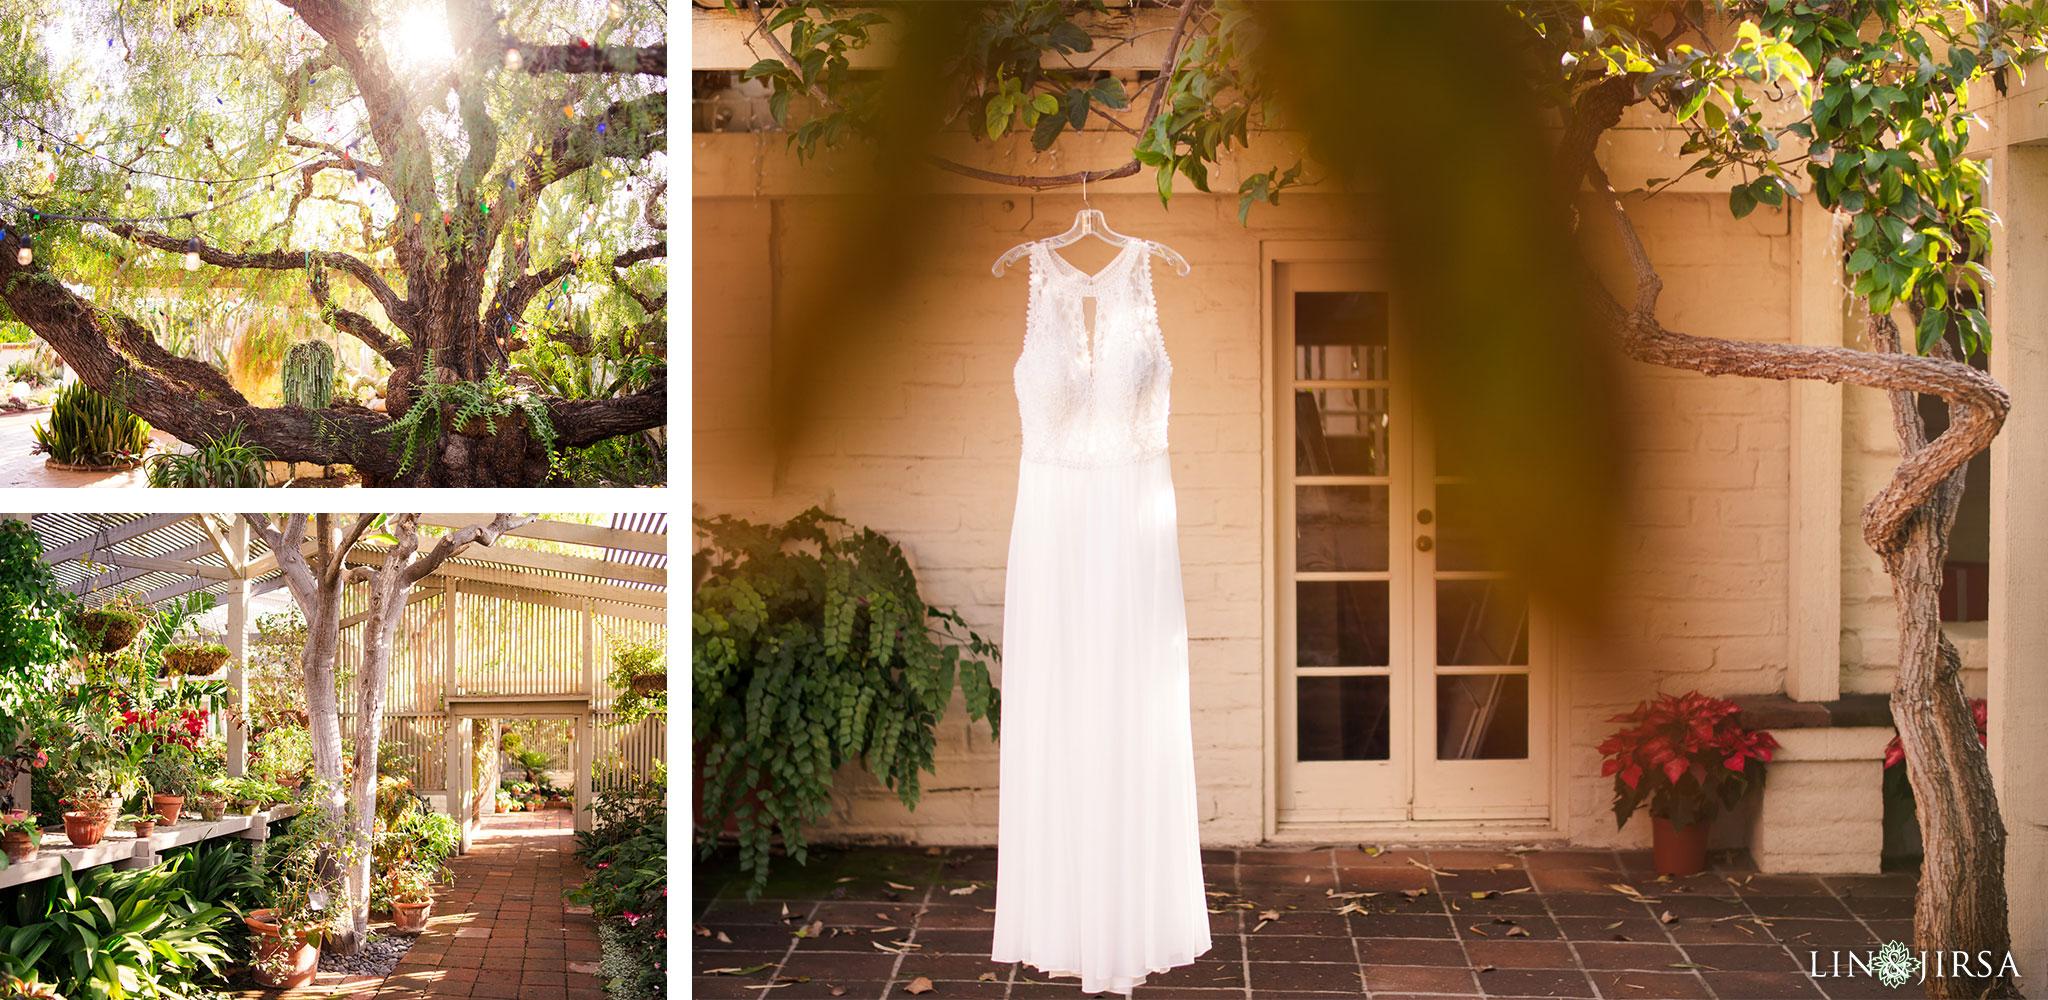 znb sherman library gardens orange county wedding photography